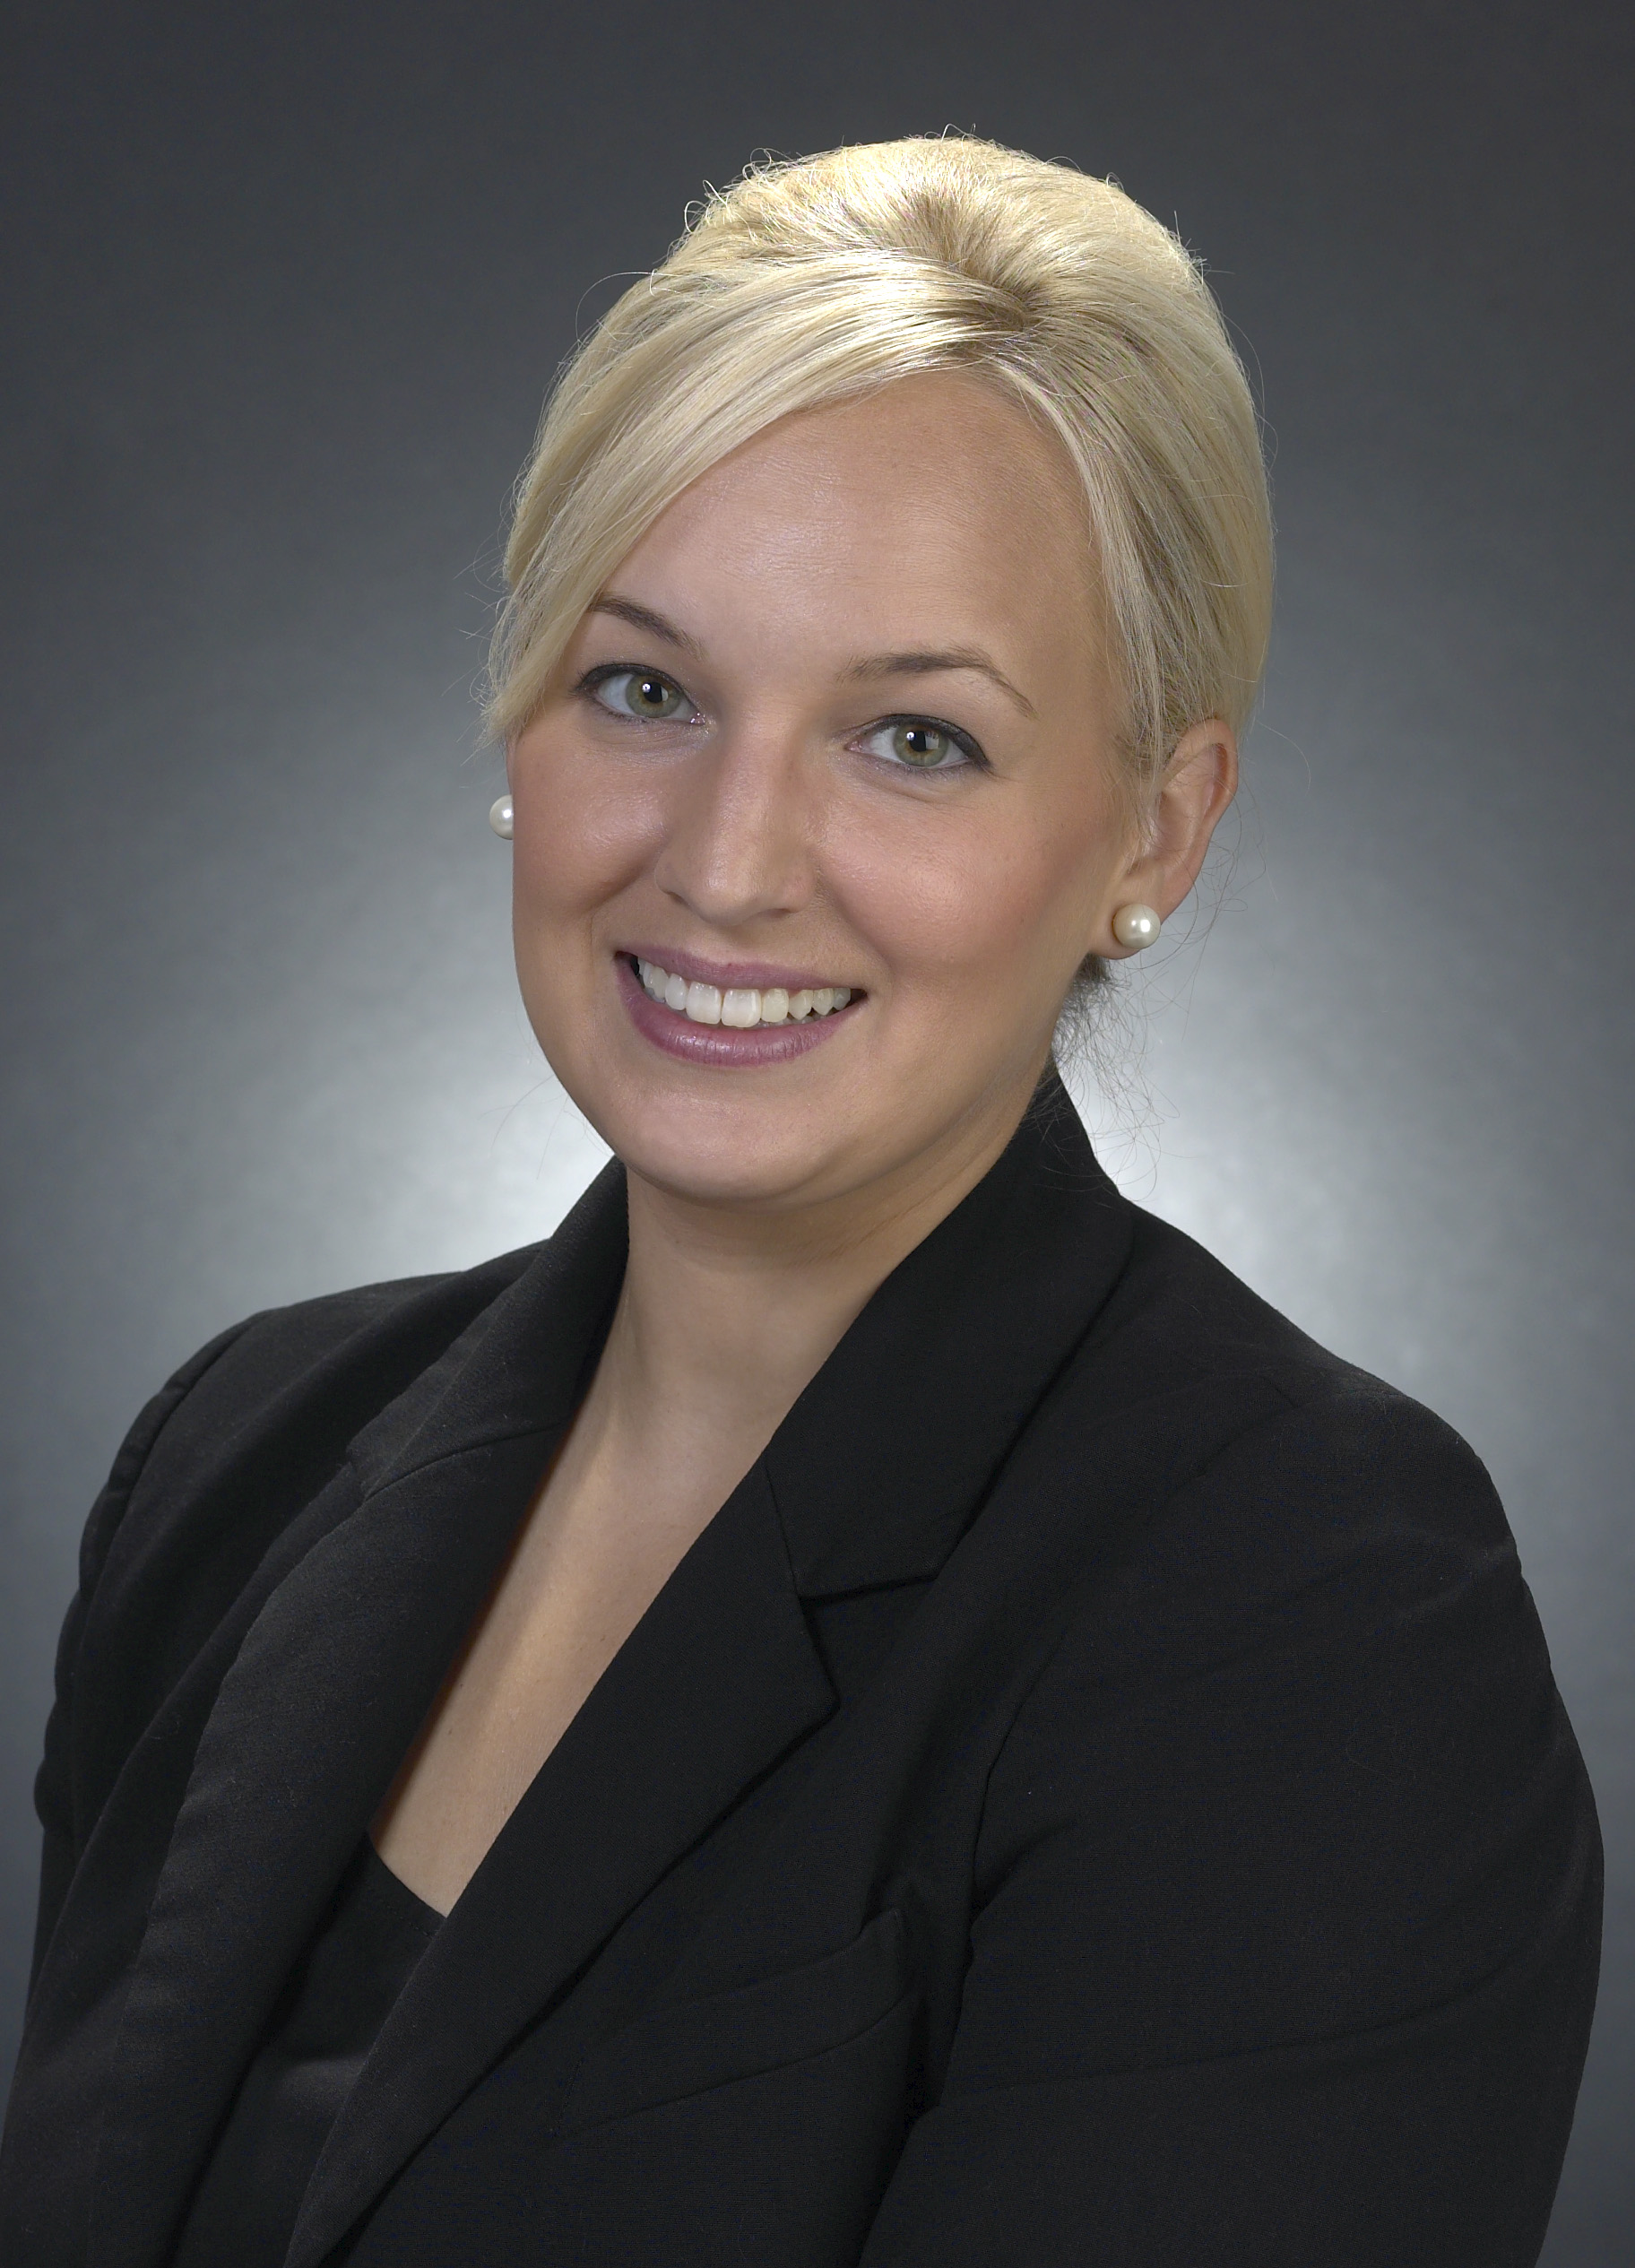 Melissa Morris HeadShot